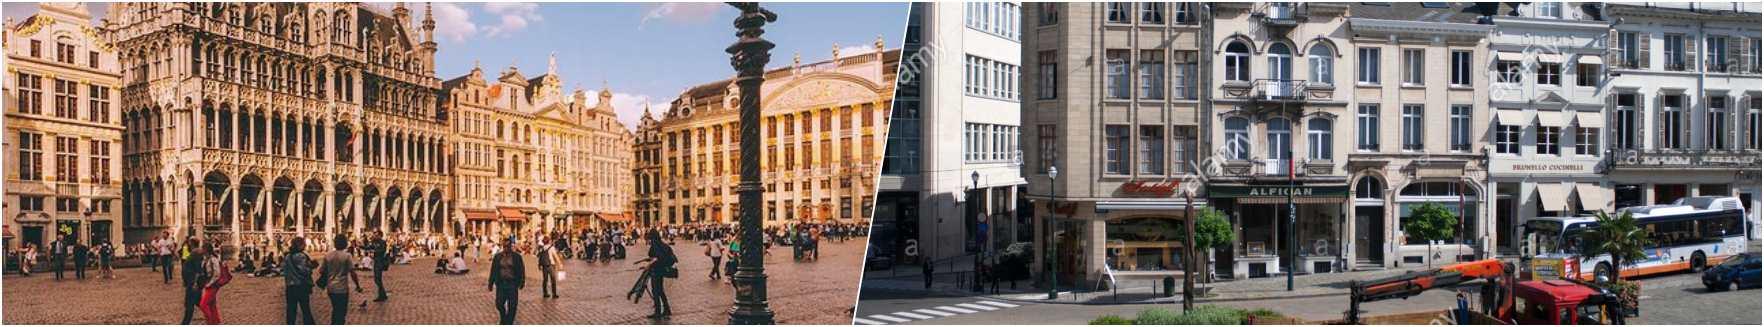 Brussels - Grand Sablon